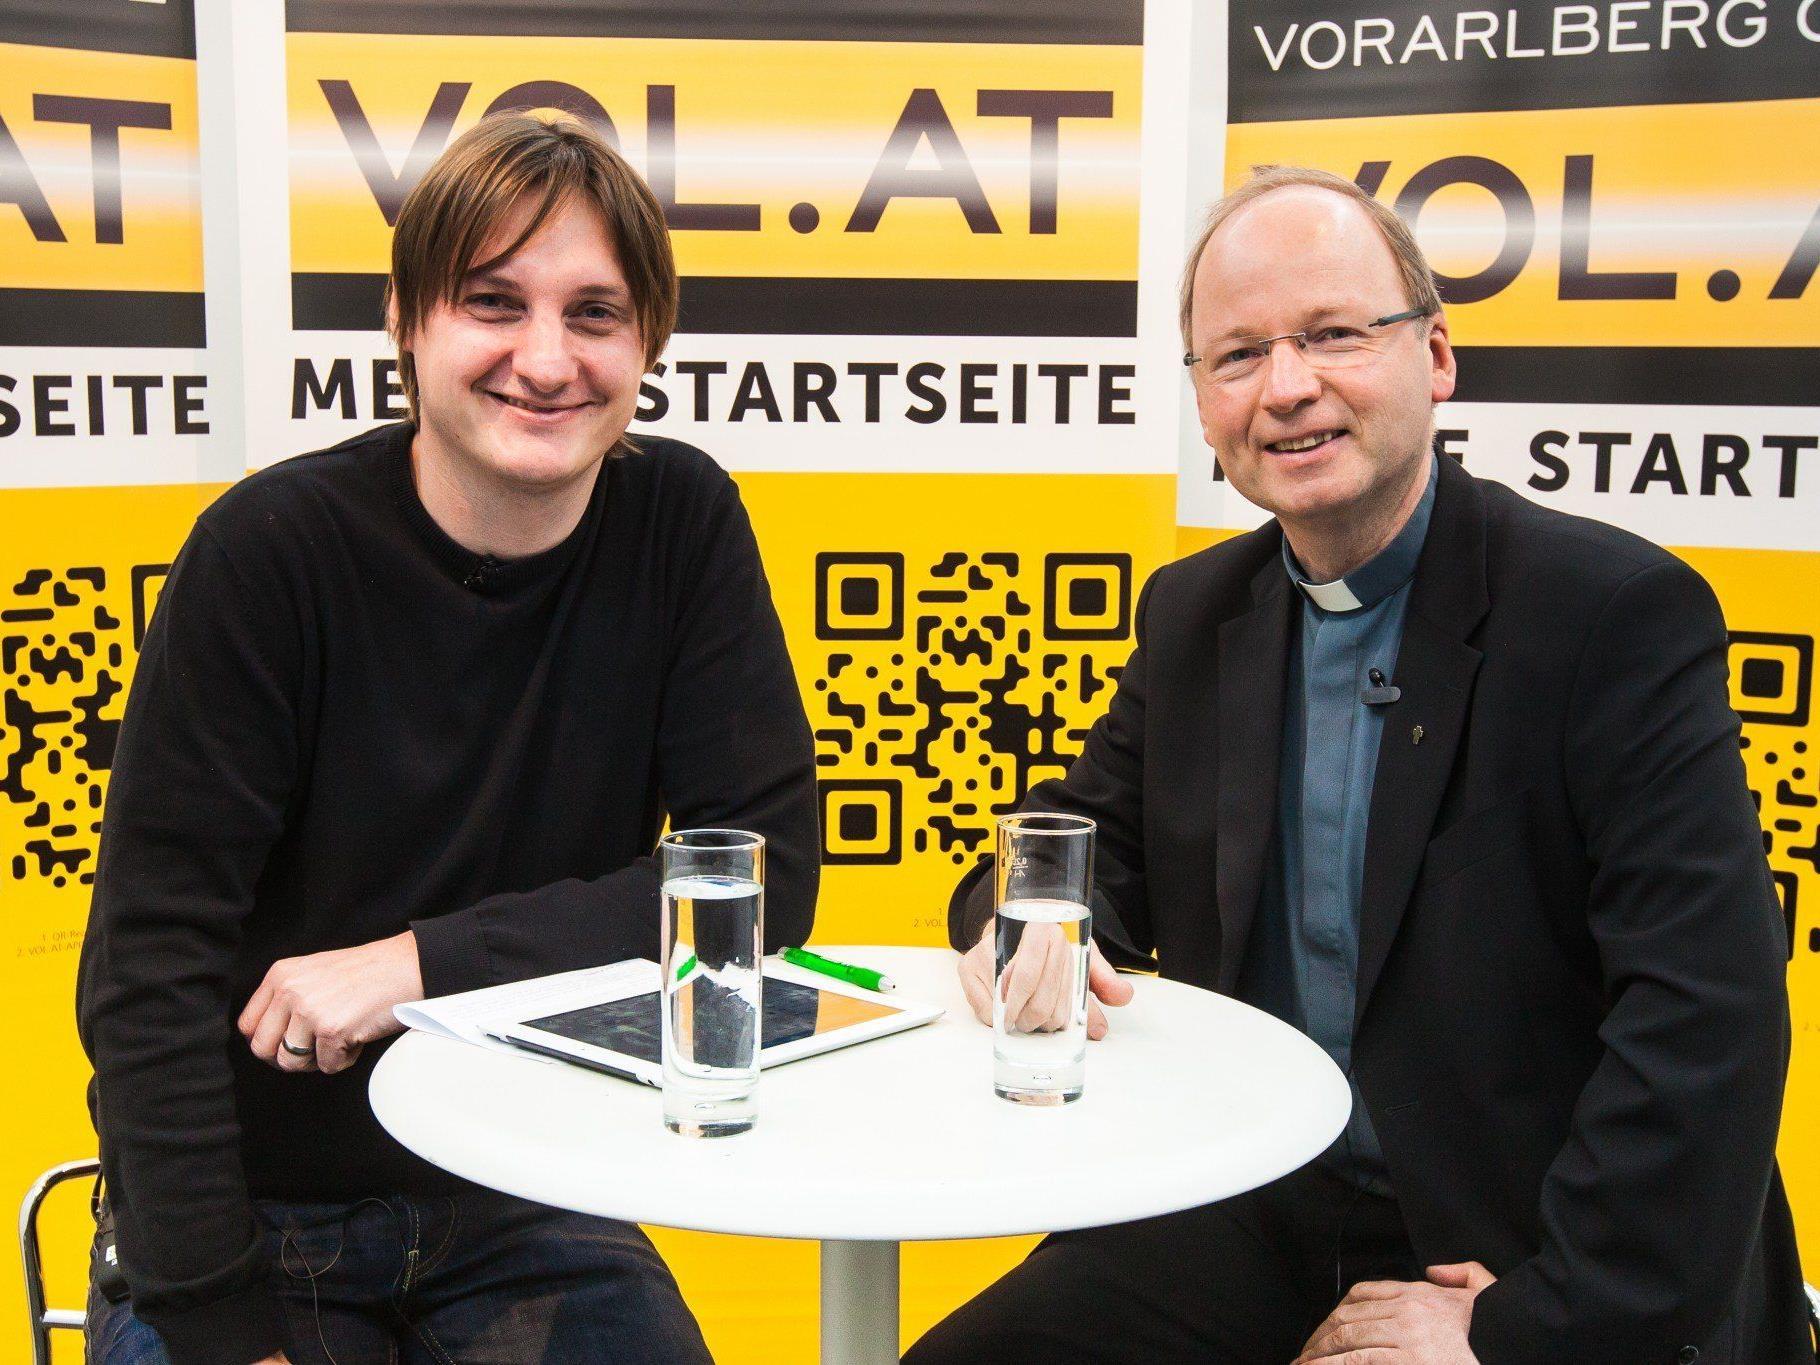 VOL.AT-CR Marc Springer mit Benno Elbs, Administrator der Diözese Feldkirch (v.l.)